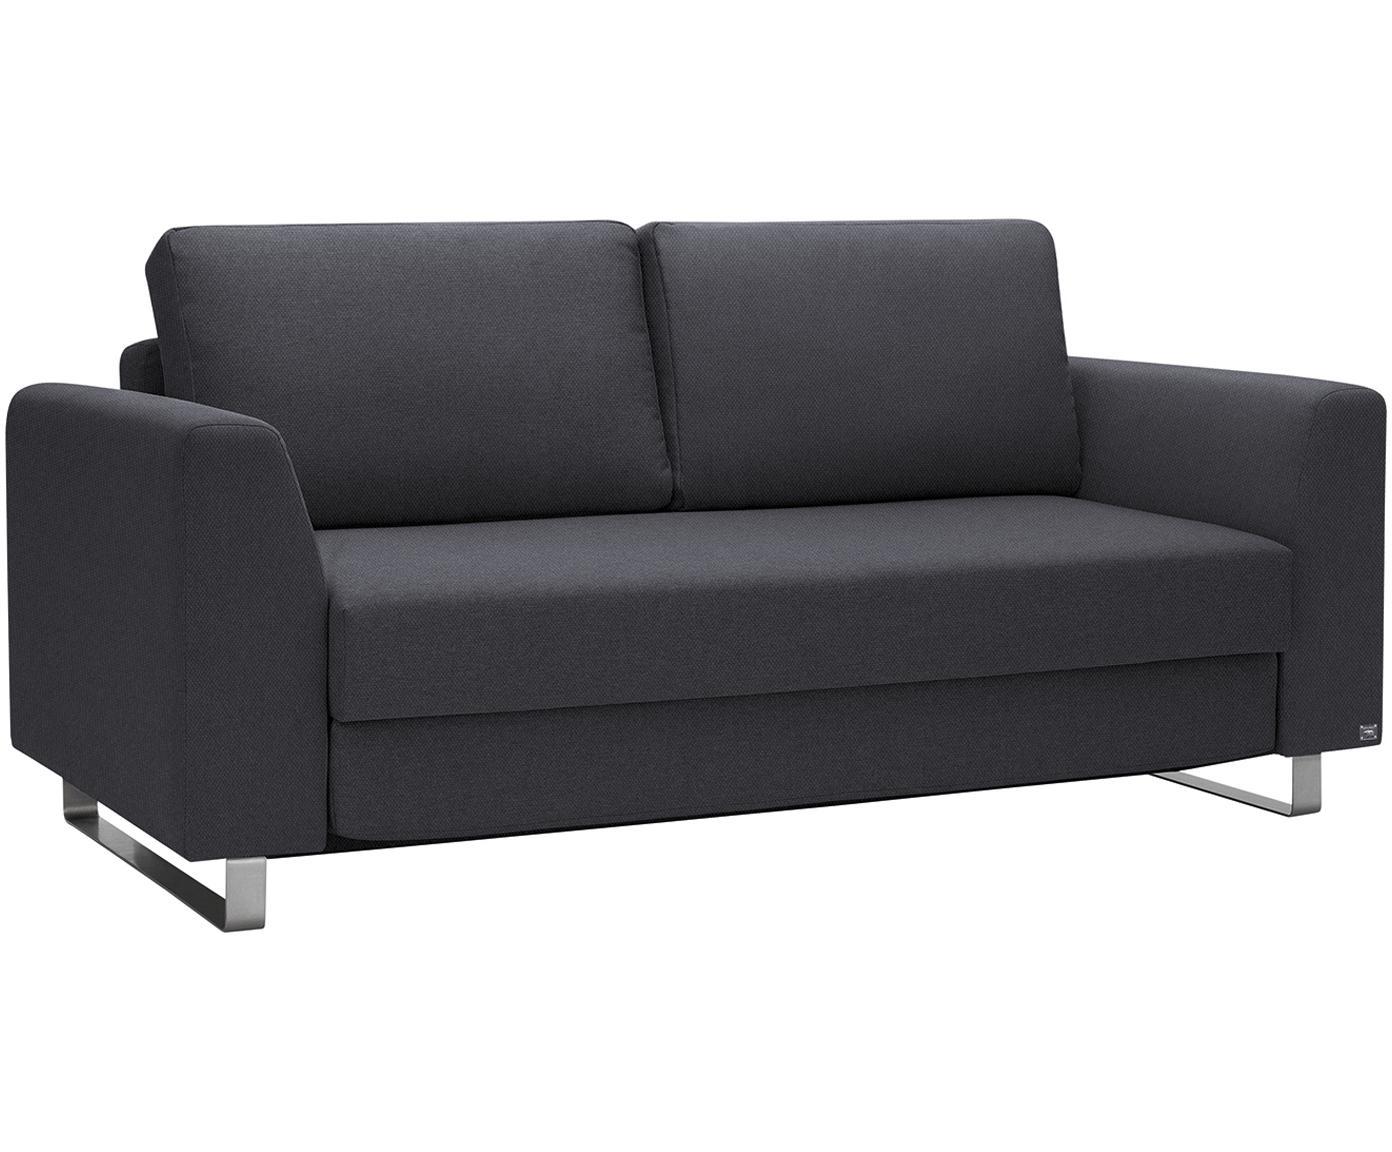 Schlafsofa Bruno (3-Sitzer), Bezug: Pflegeleichtes robustes P, Rahmen: Massivholz, Webstoff Anthrazit, B 200 x T 84 cm